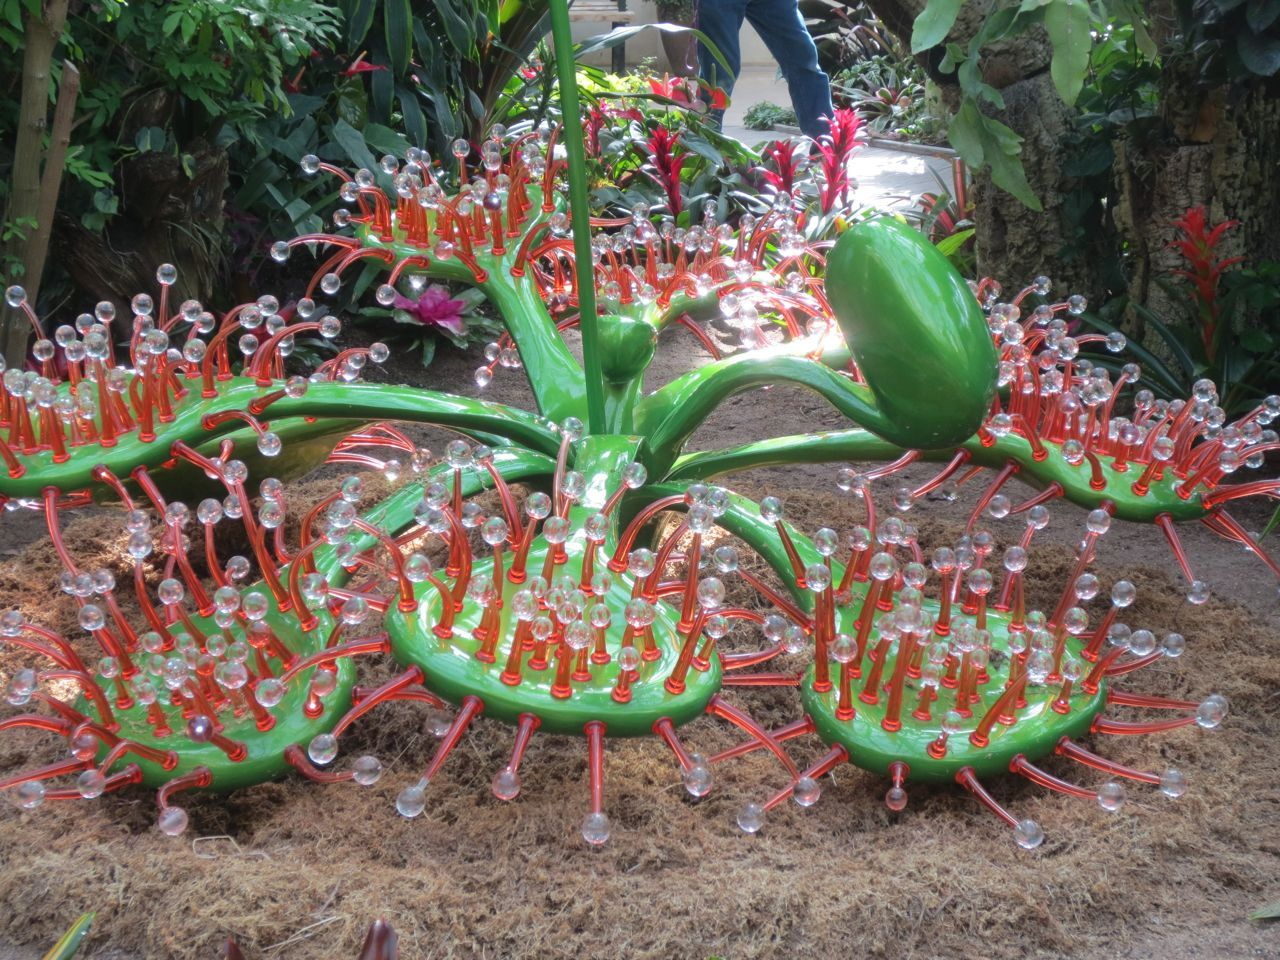 Sundew Drosera Sculpture Savage Gardens Exhibit Carnivorous Plants